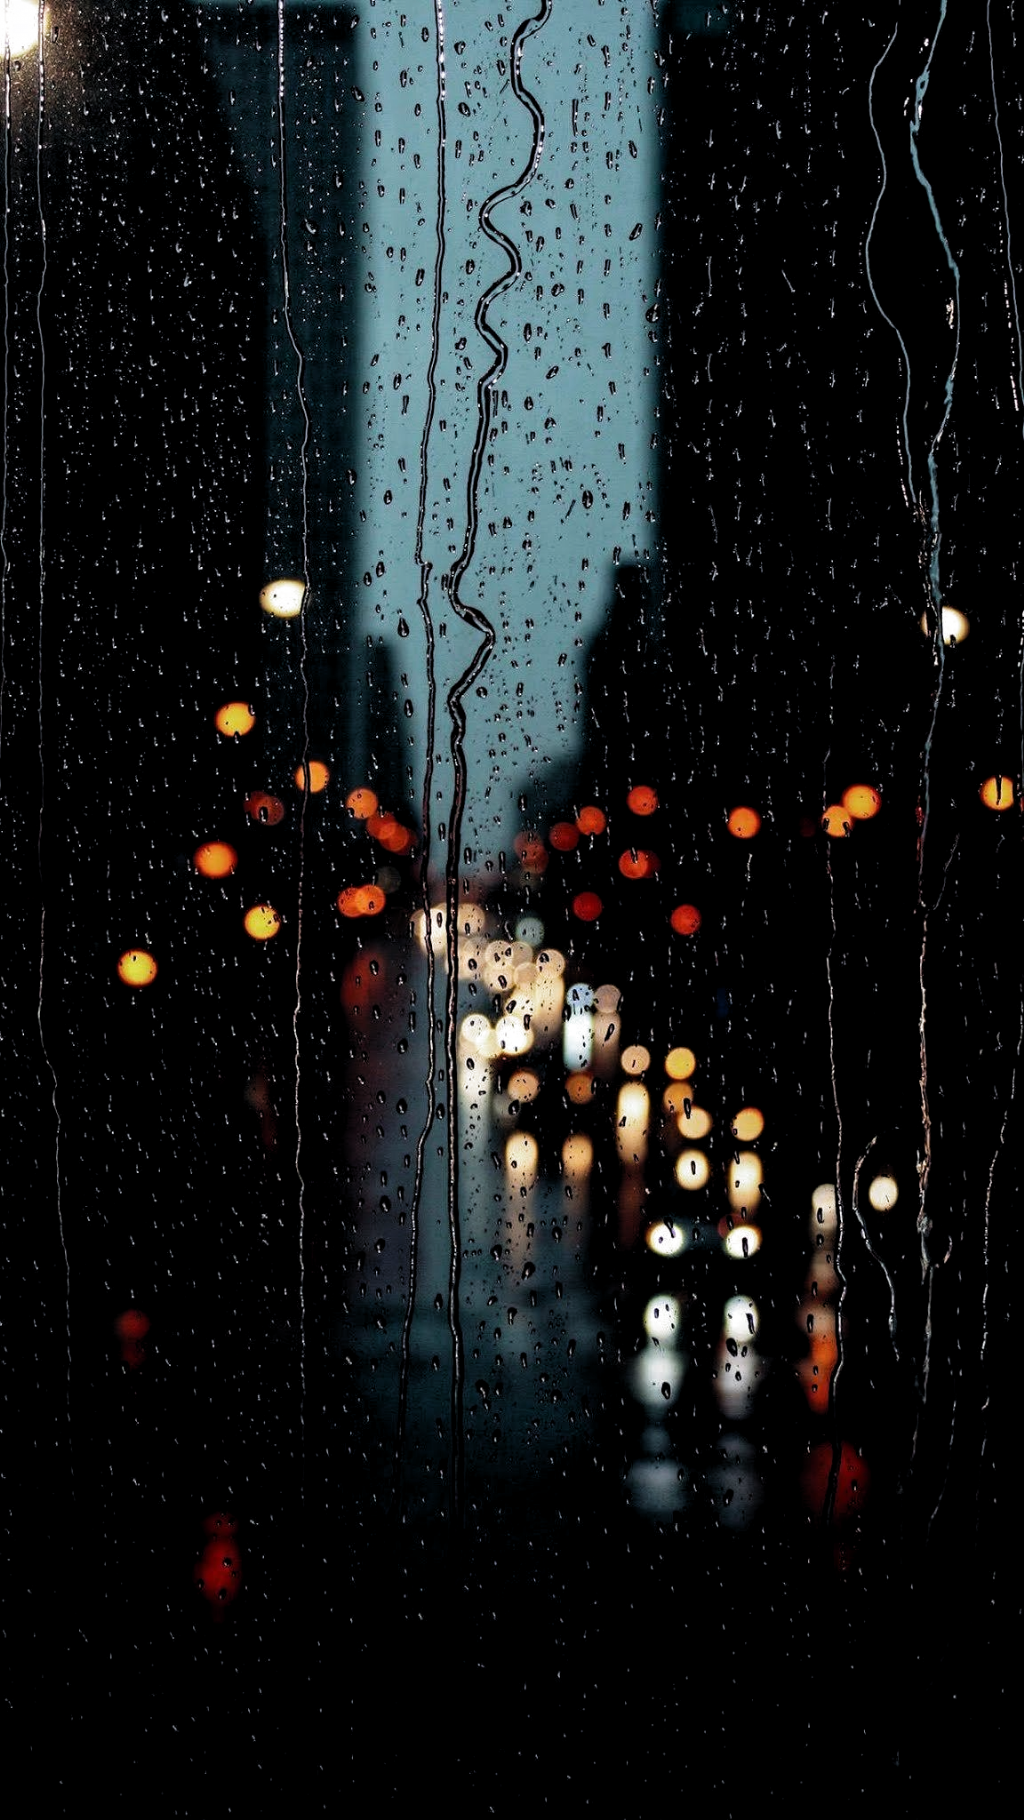 Rain Drops On Window Glass Mobile Wallpaper Smart Phone Wallpapers 4kphonewallpapersreddi Rainy Wallpaper Wallpaper Backgrounds Wallpaper Tumblr Lockscreen